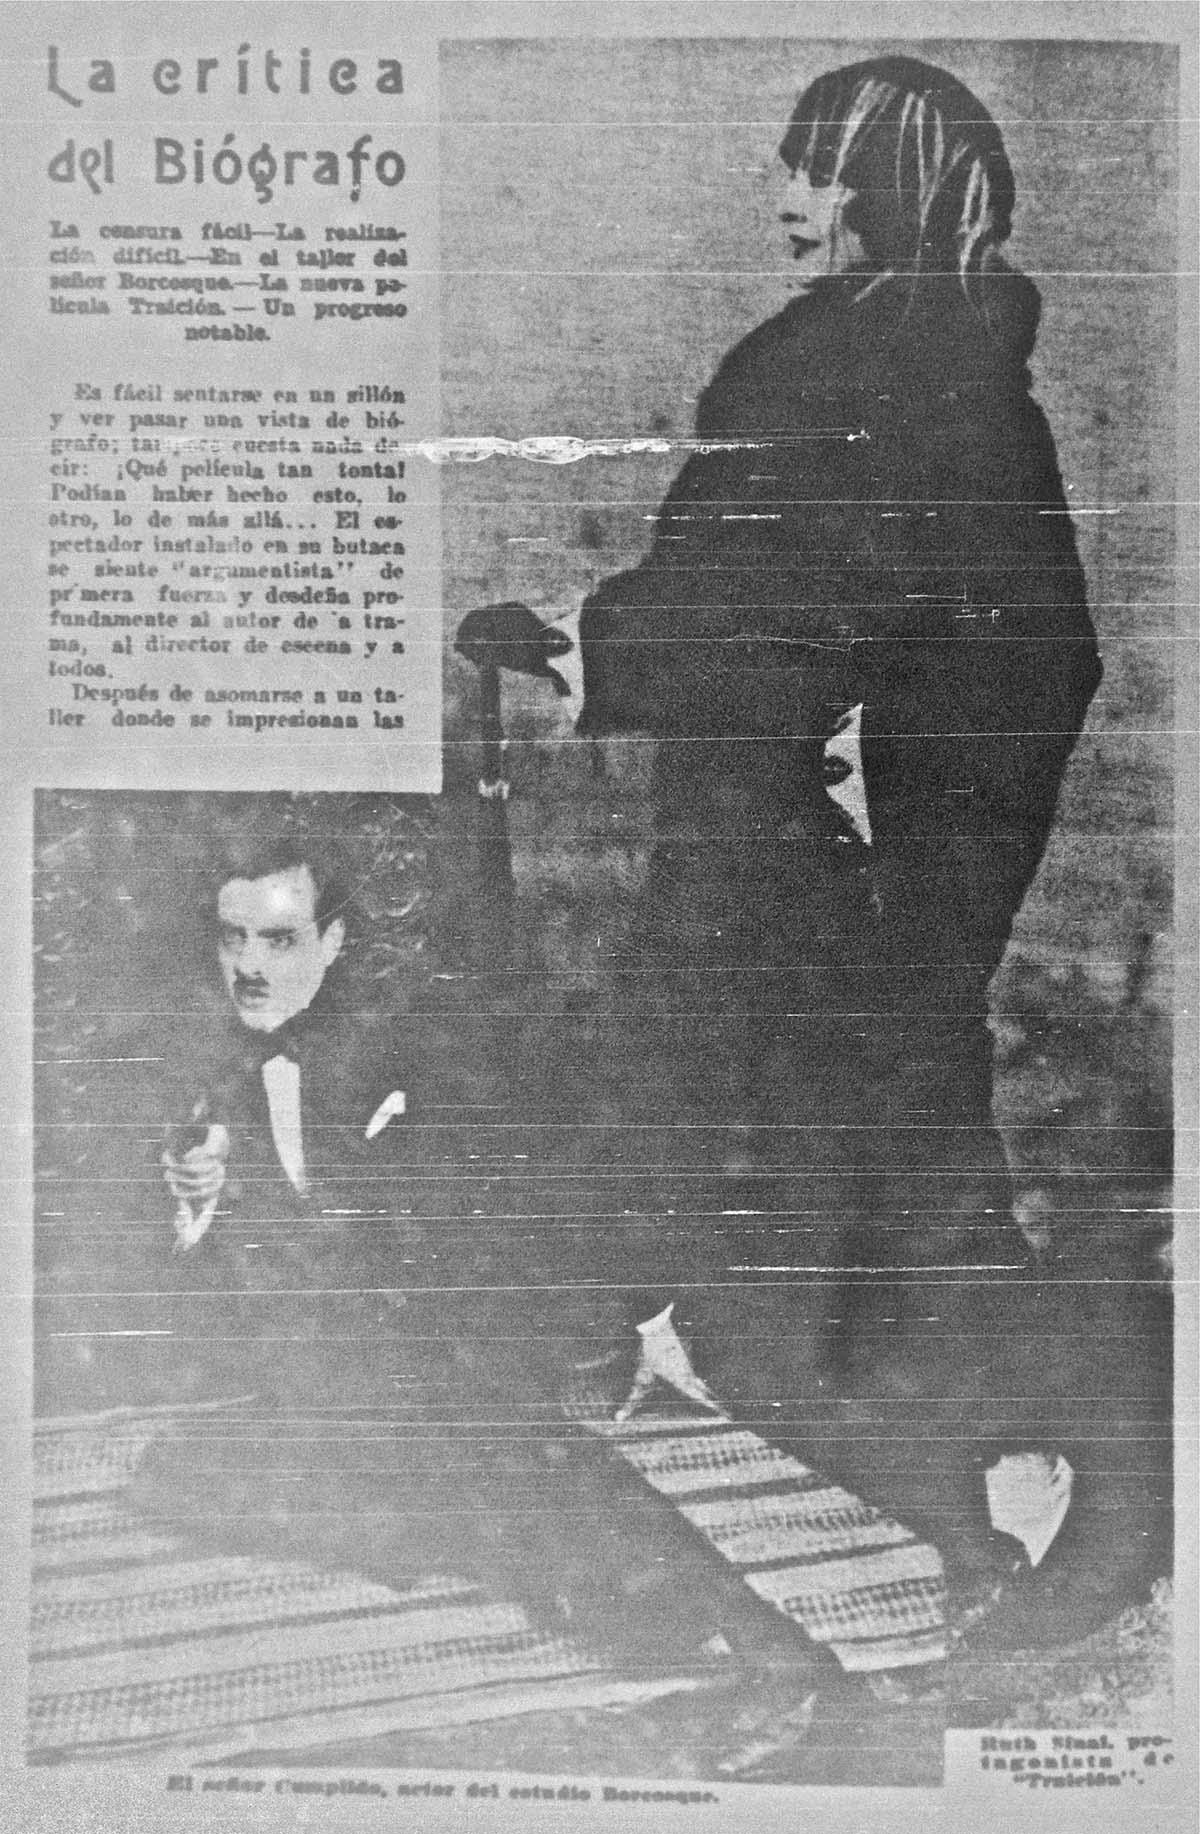 1923-07-01_Zig-Zag.Stgo_ [NOTI] CriticadelBiogra_Traicion_COMPLET_0_low.jpg